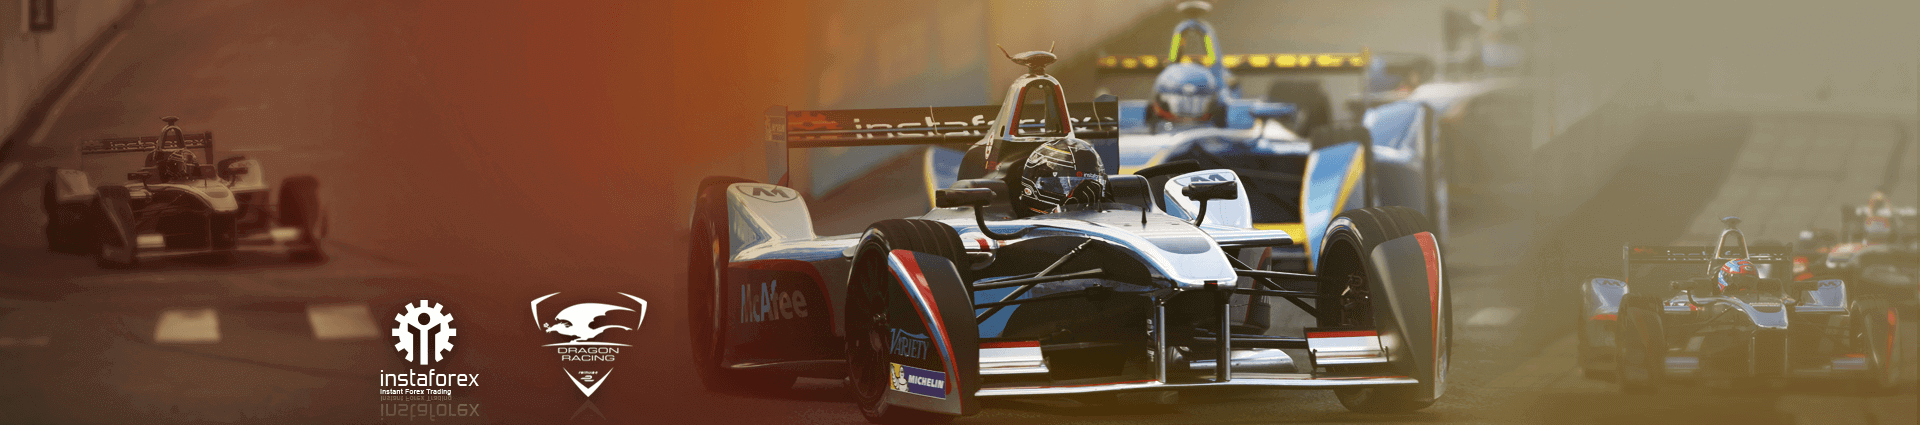 InstaForex - official partner of Dragon Racing